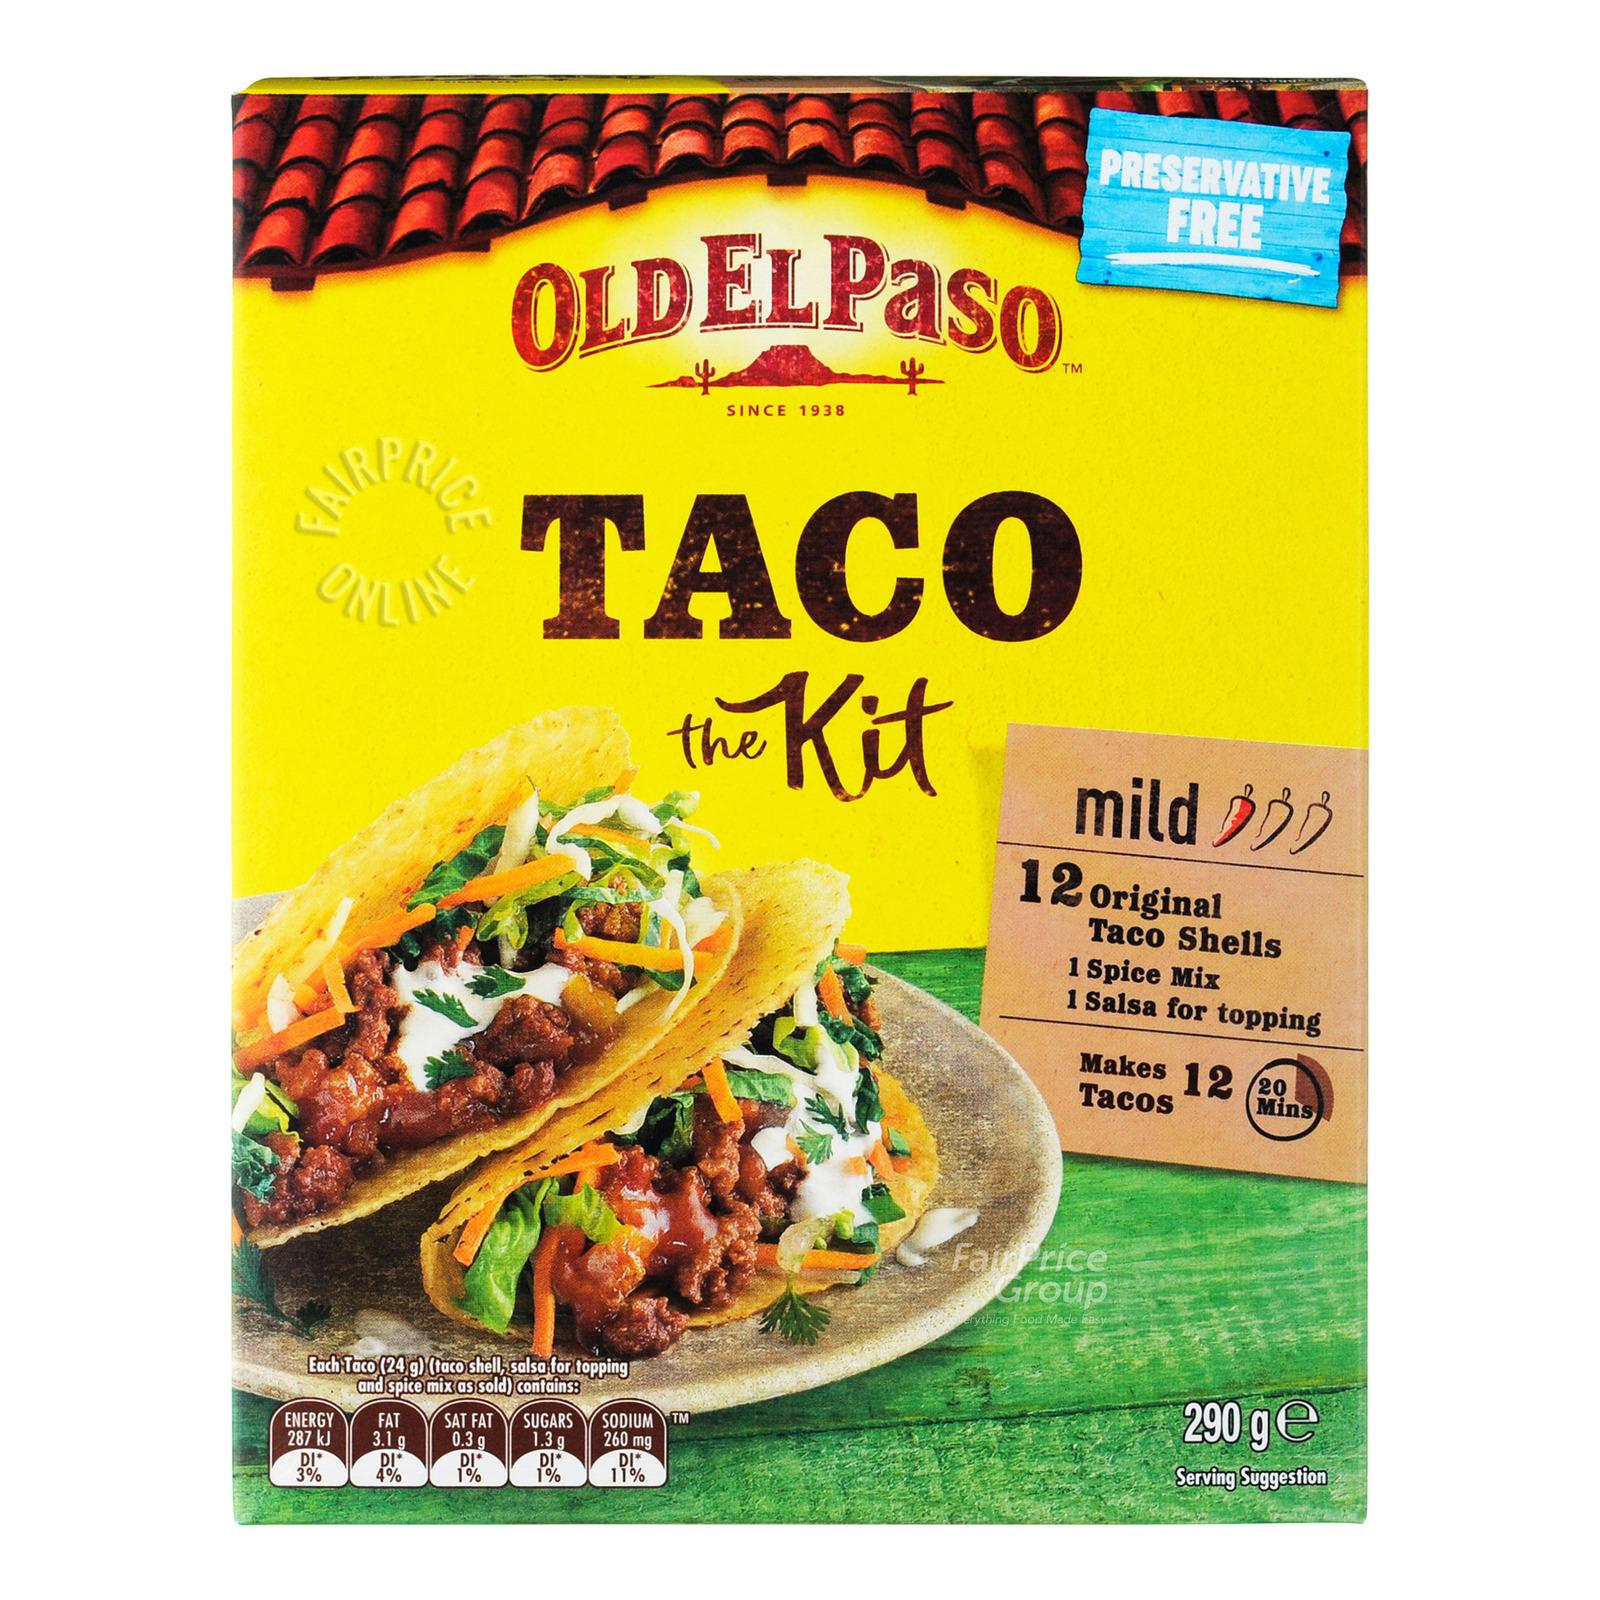 Old El Paso Taco Kit Mild Spicy Ntuc Fairprice